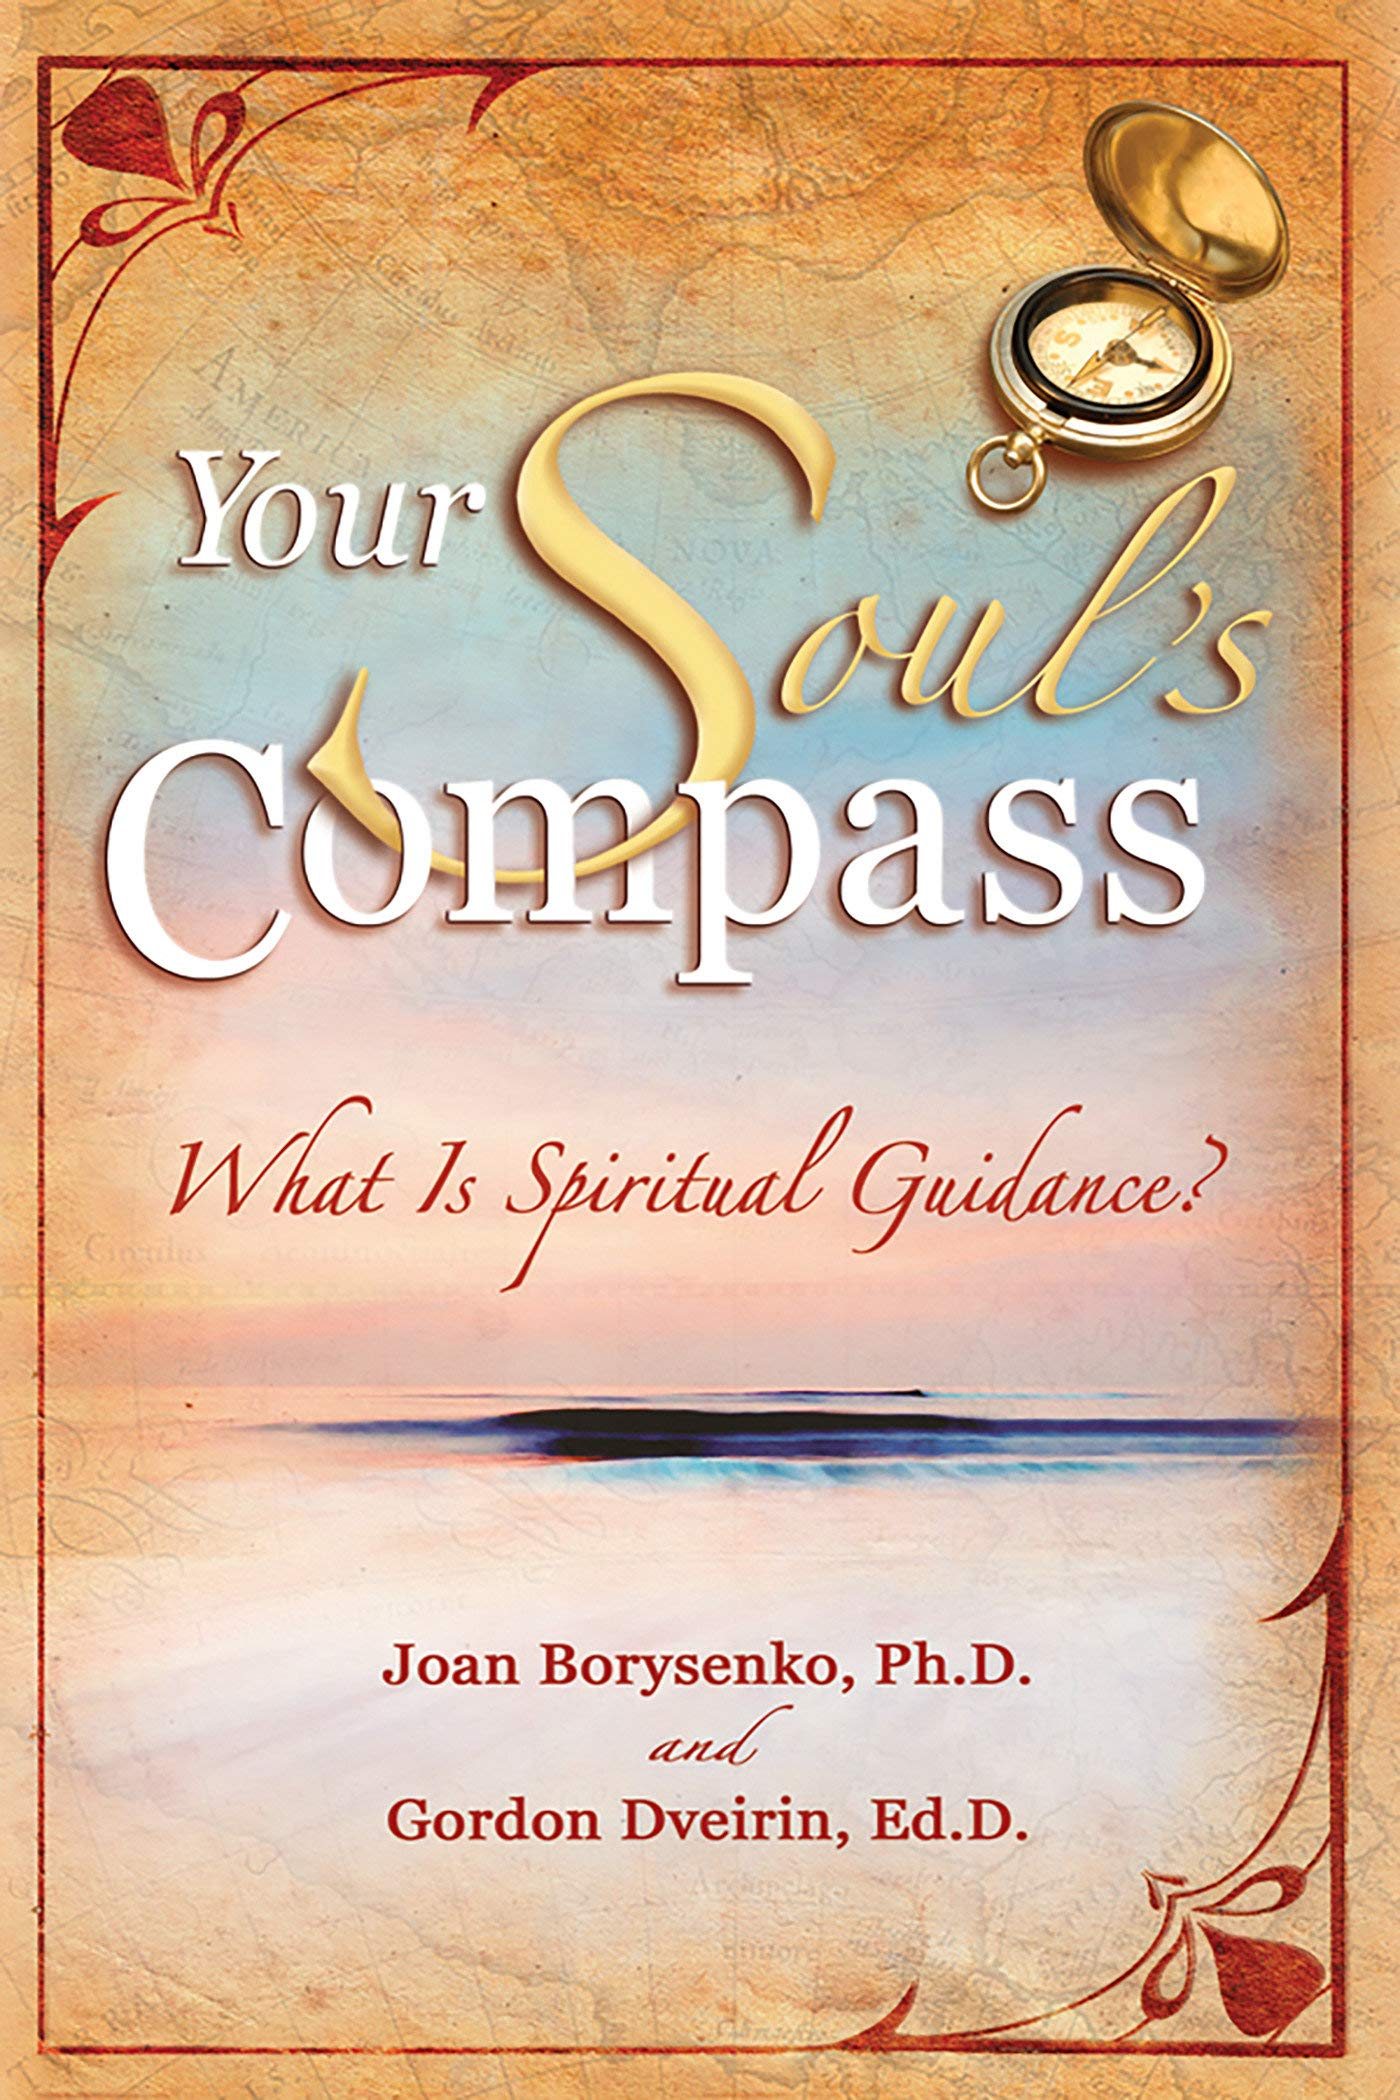 Your Soul's Compass: What Is Spiritual Guidance?: Joan Borysenko:  9781401907778: Amazon.com: Books